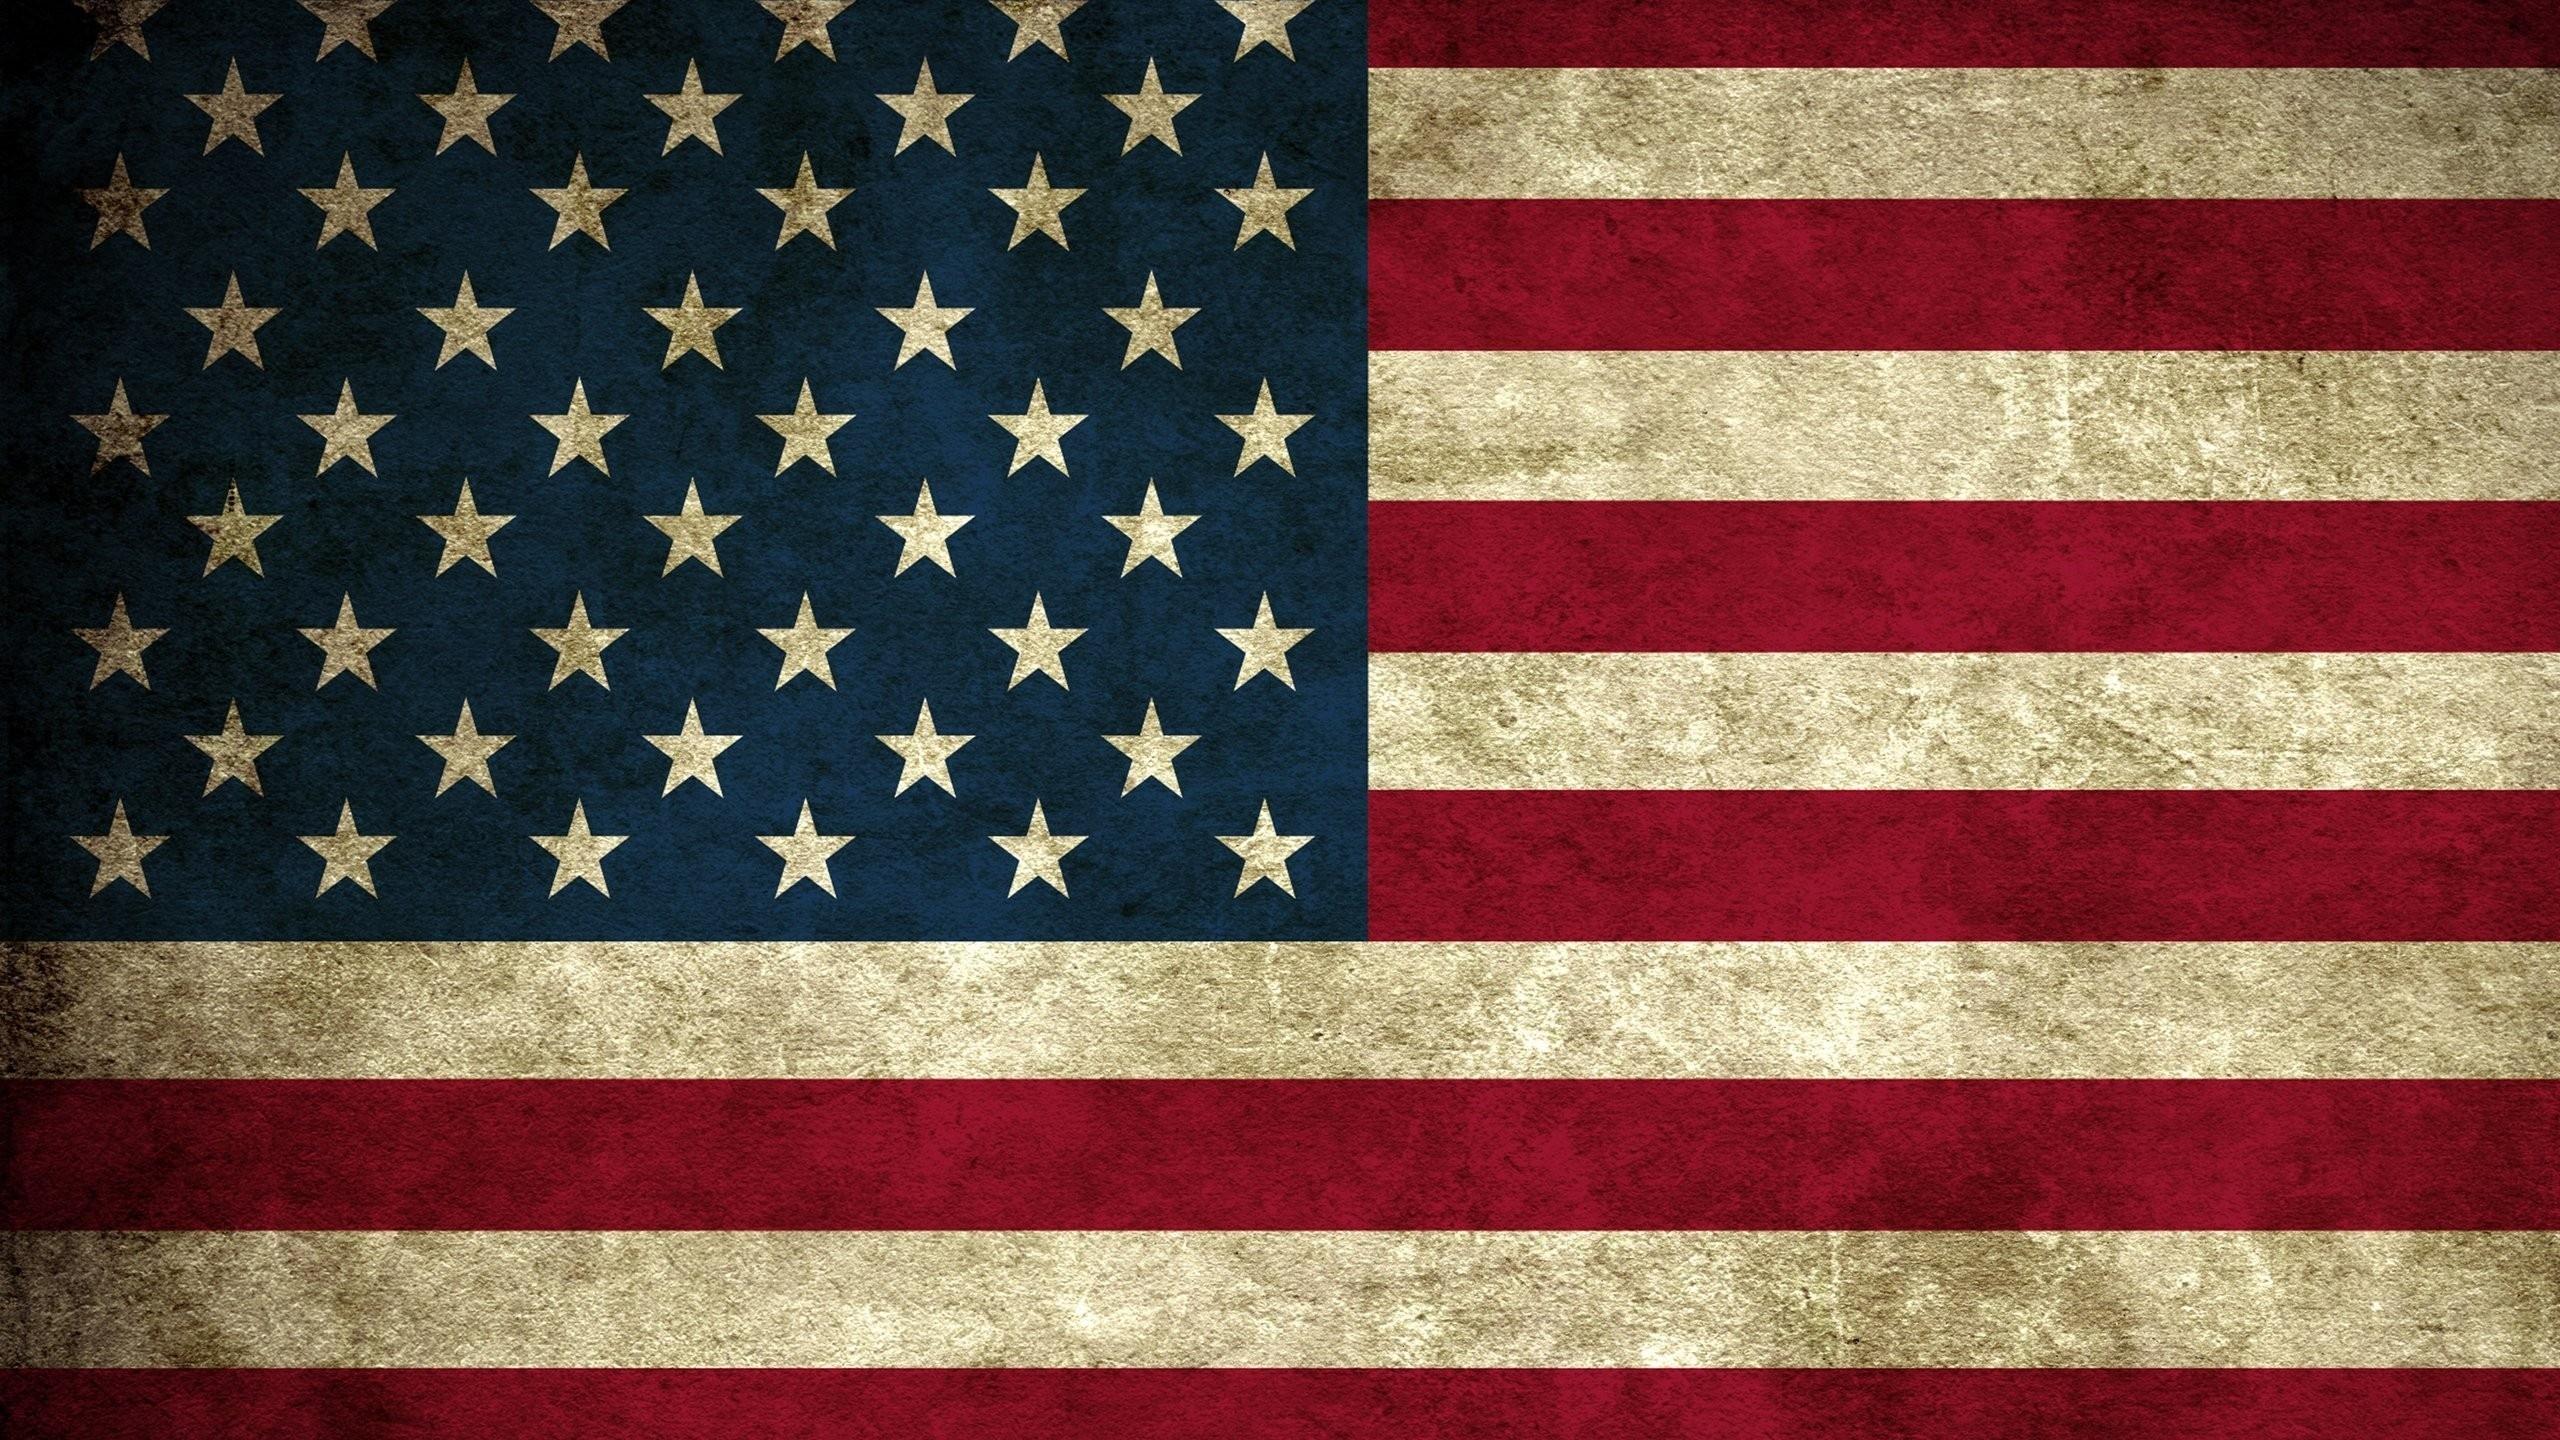 United State Flag Wallpaper Desktop 2560x1440